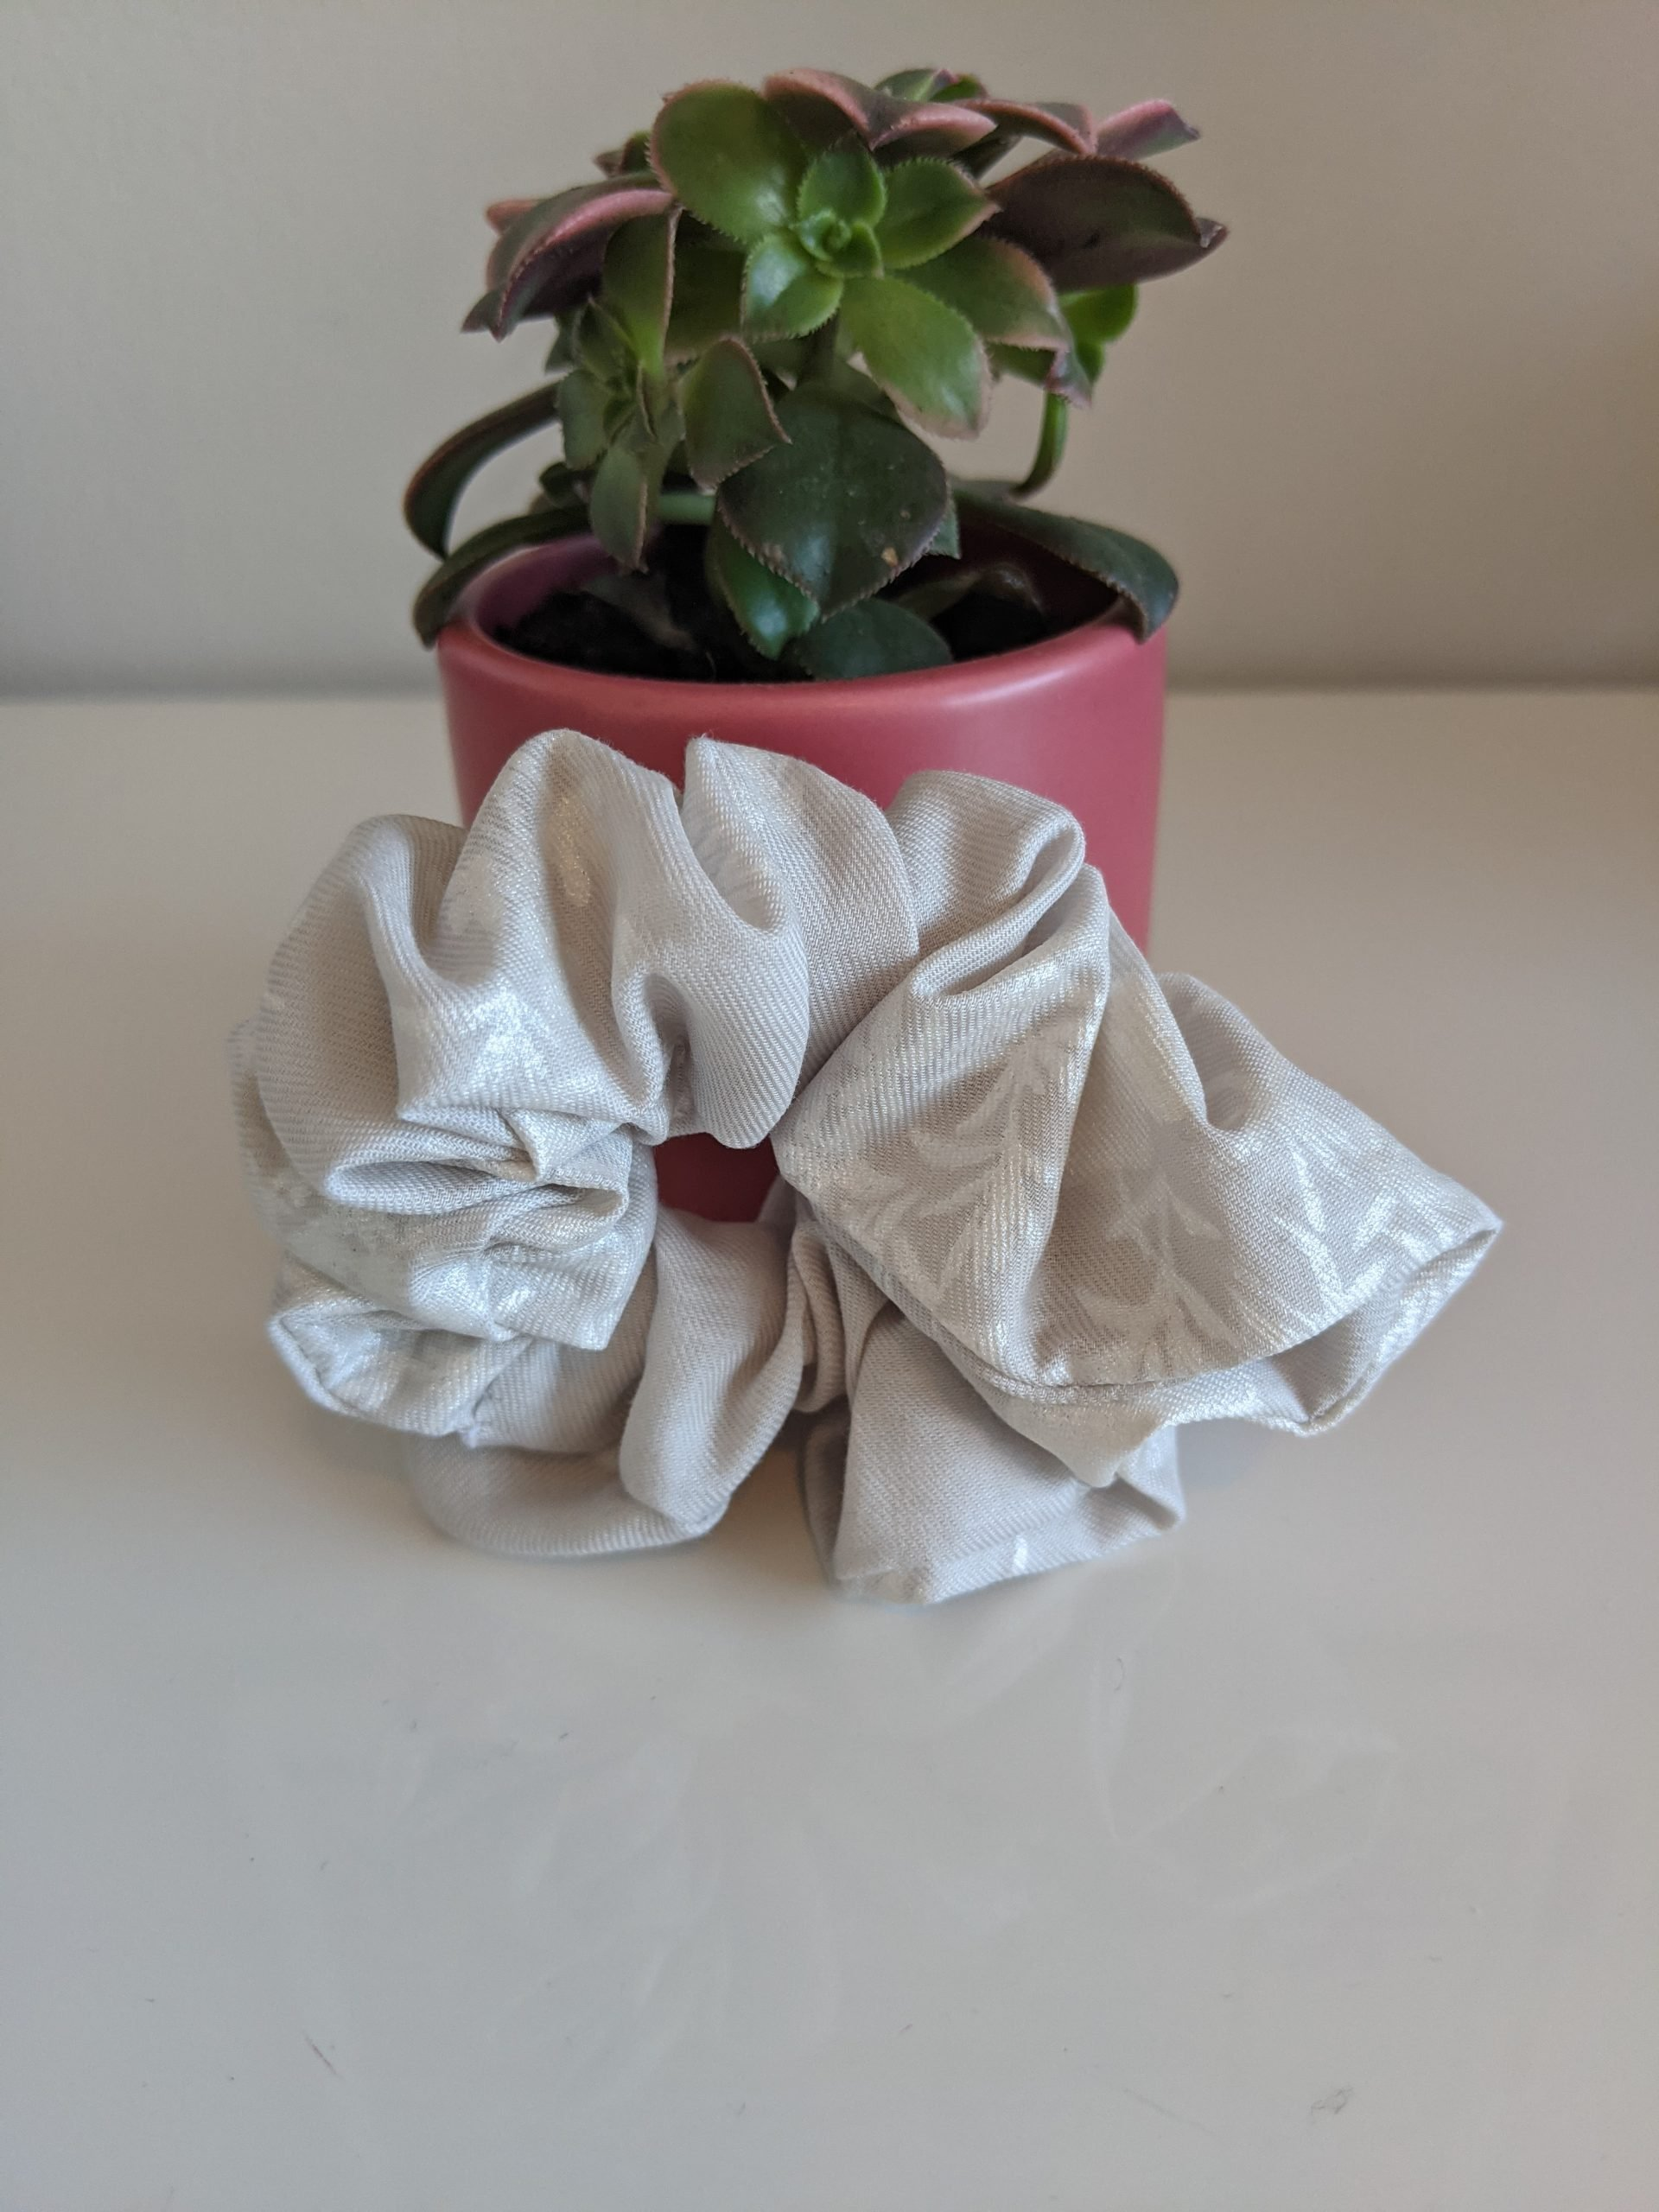 Pensive Garden scrunchie front